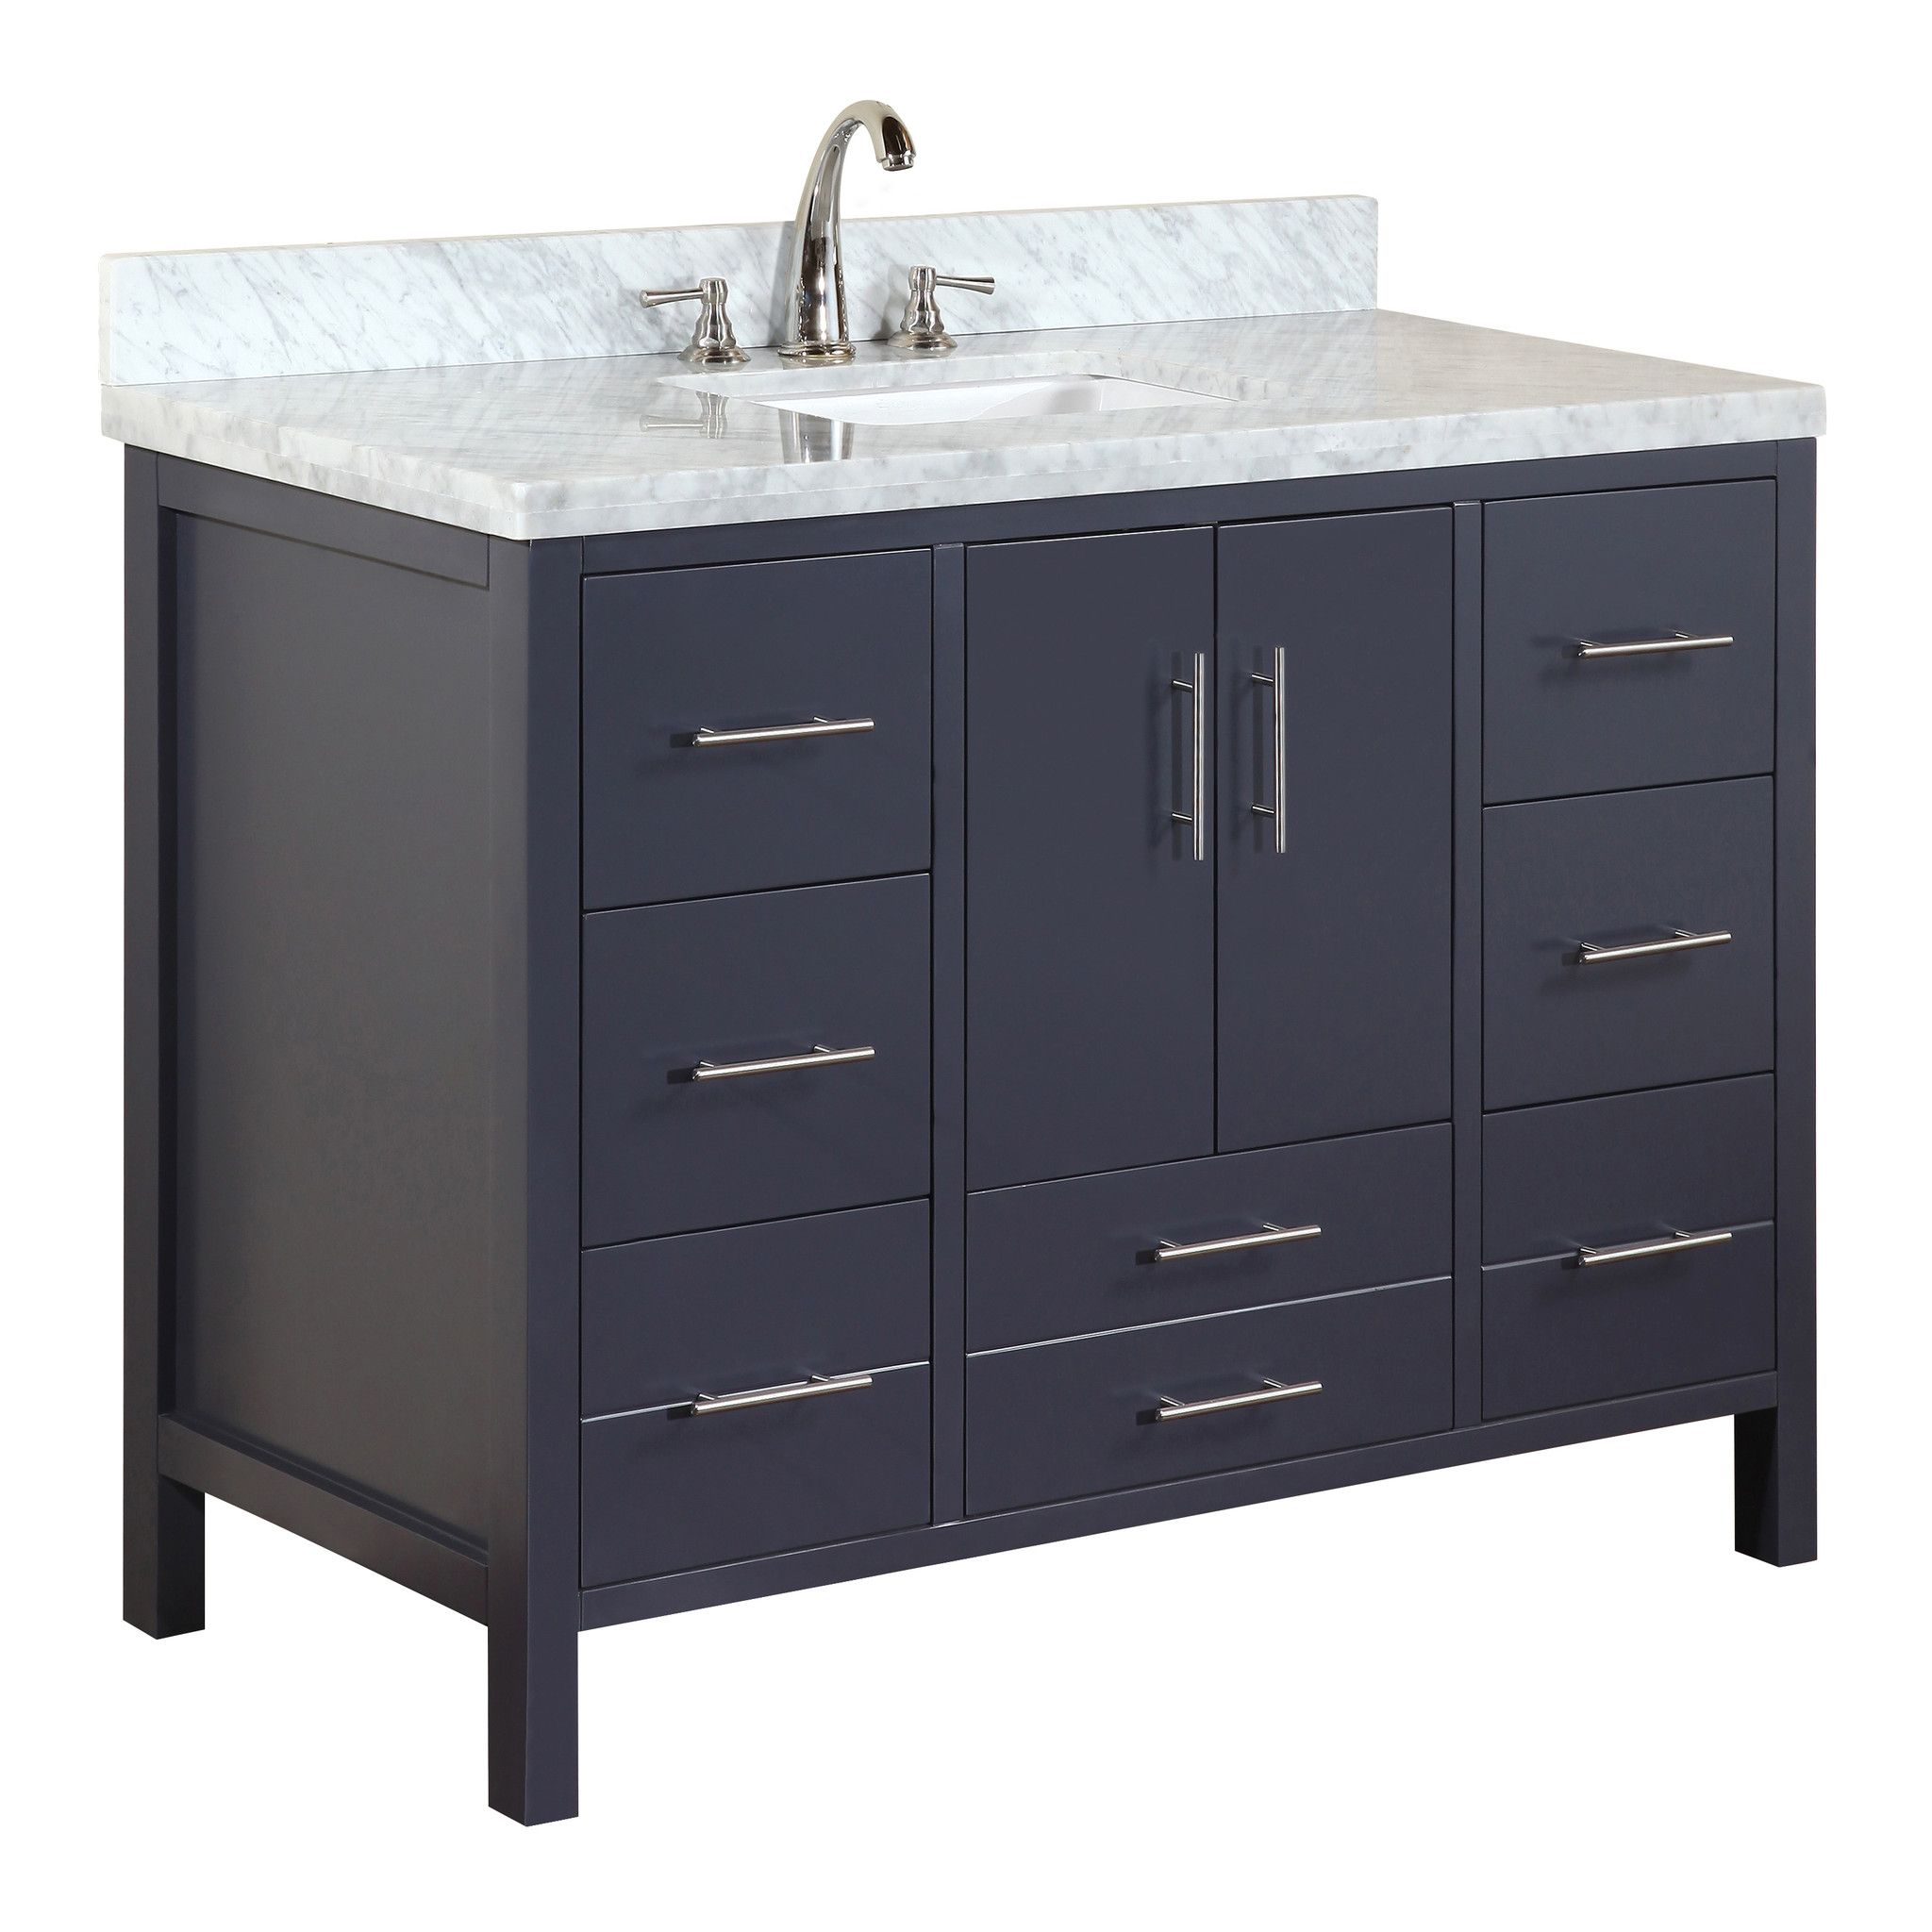 California 48 Inch Vanity Carrara Charcoal Gray Single Bathroom Vanity Bathroom Vanity Modern Bathroom Vanity